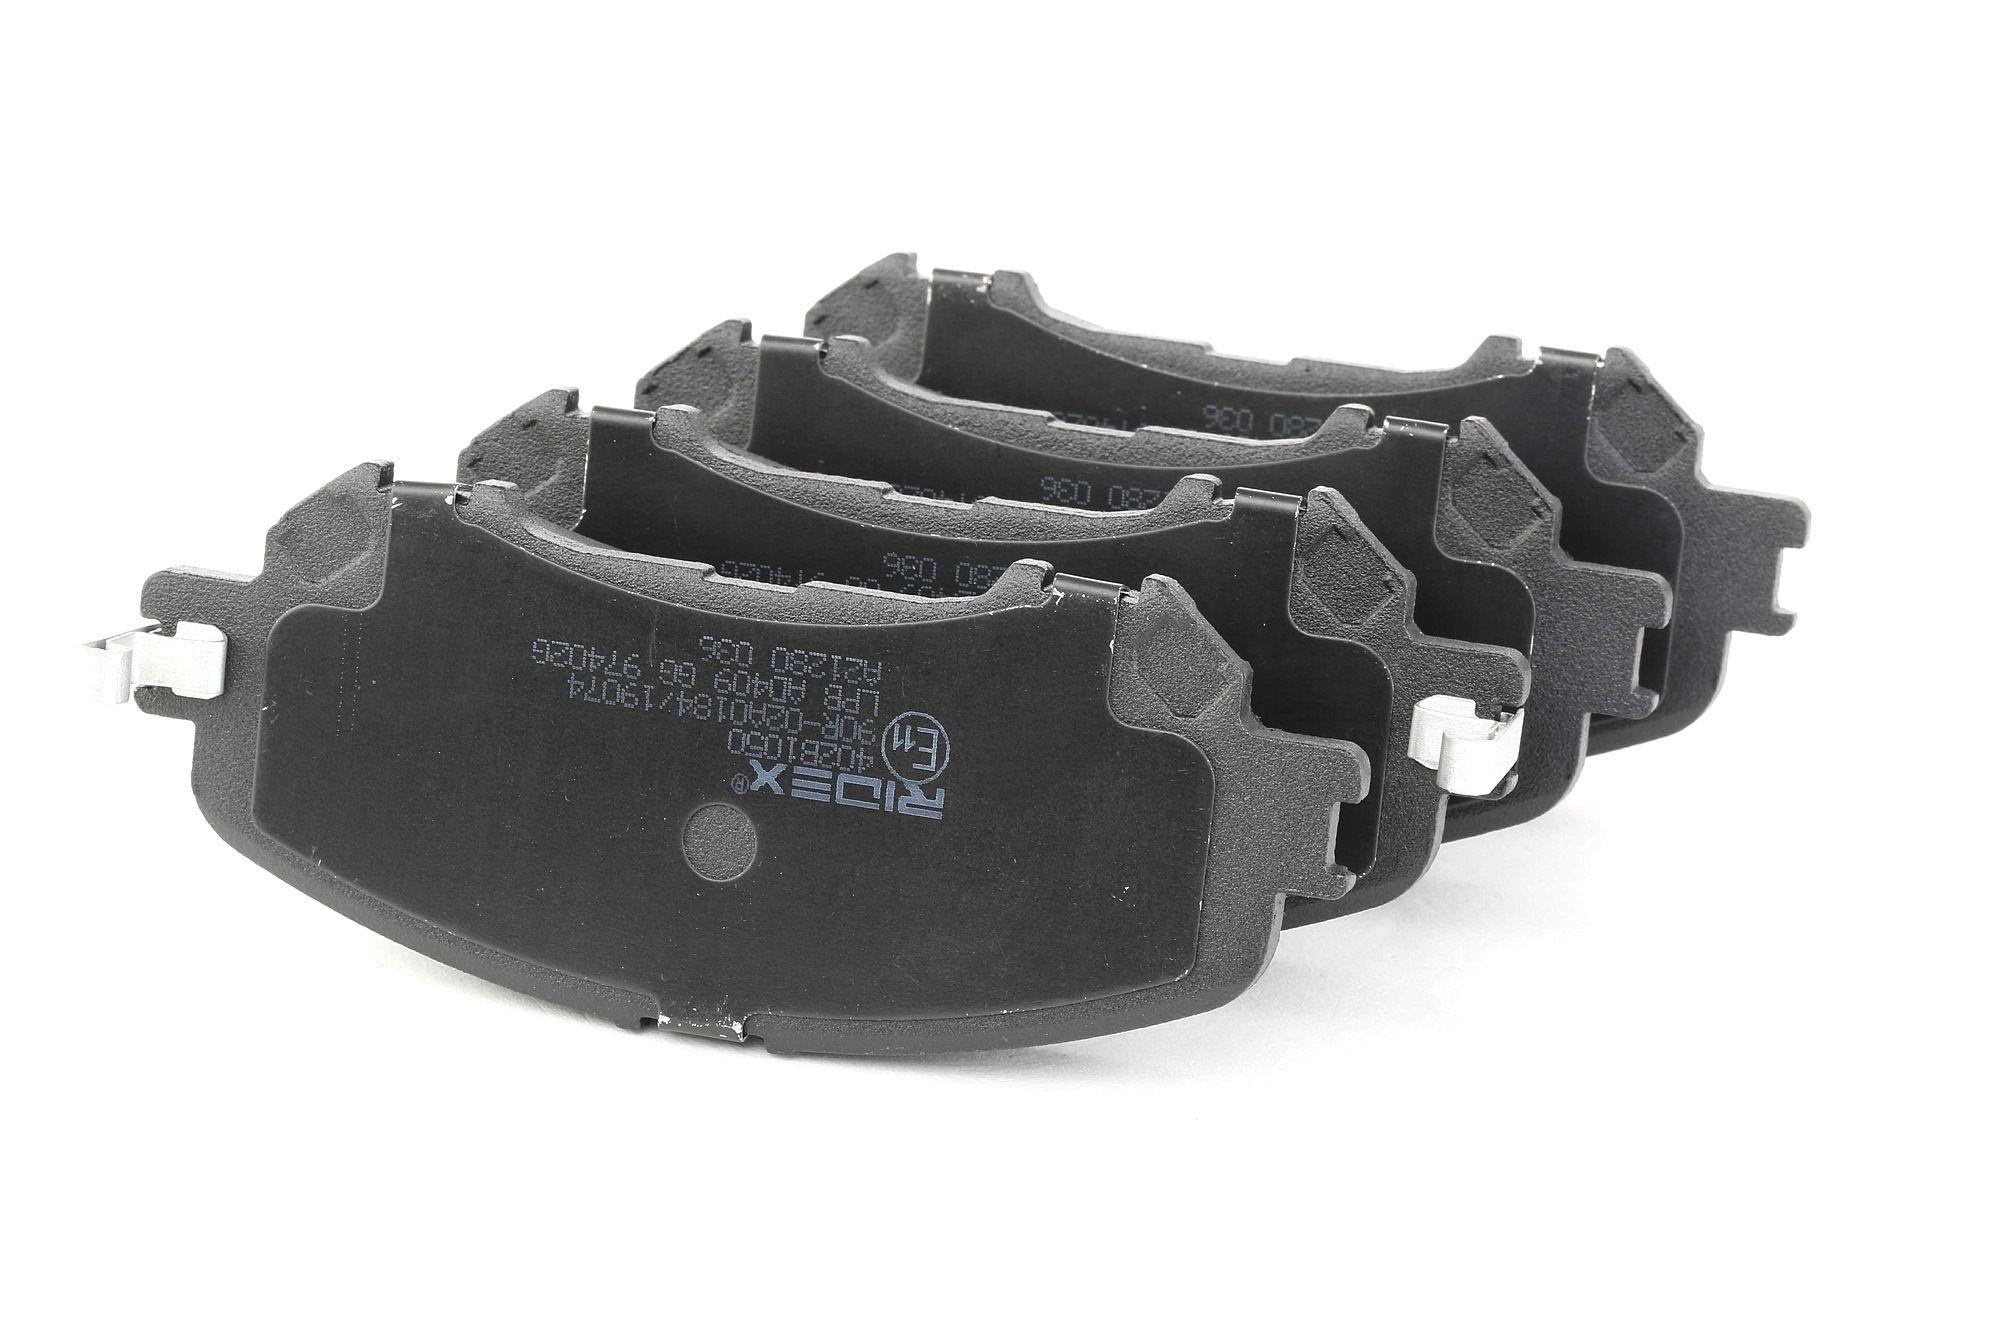 NISSAN ROGUE 2013 Bremsklötze - Original RIDEX 402B1050 Höhe: 59,2mm, Breite: 141,6mm, Dicke/Stärke: 18,5mm